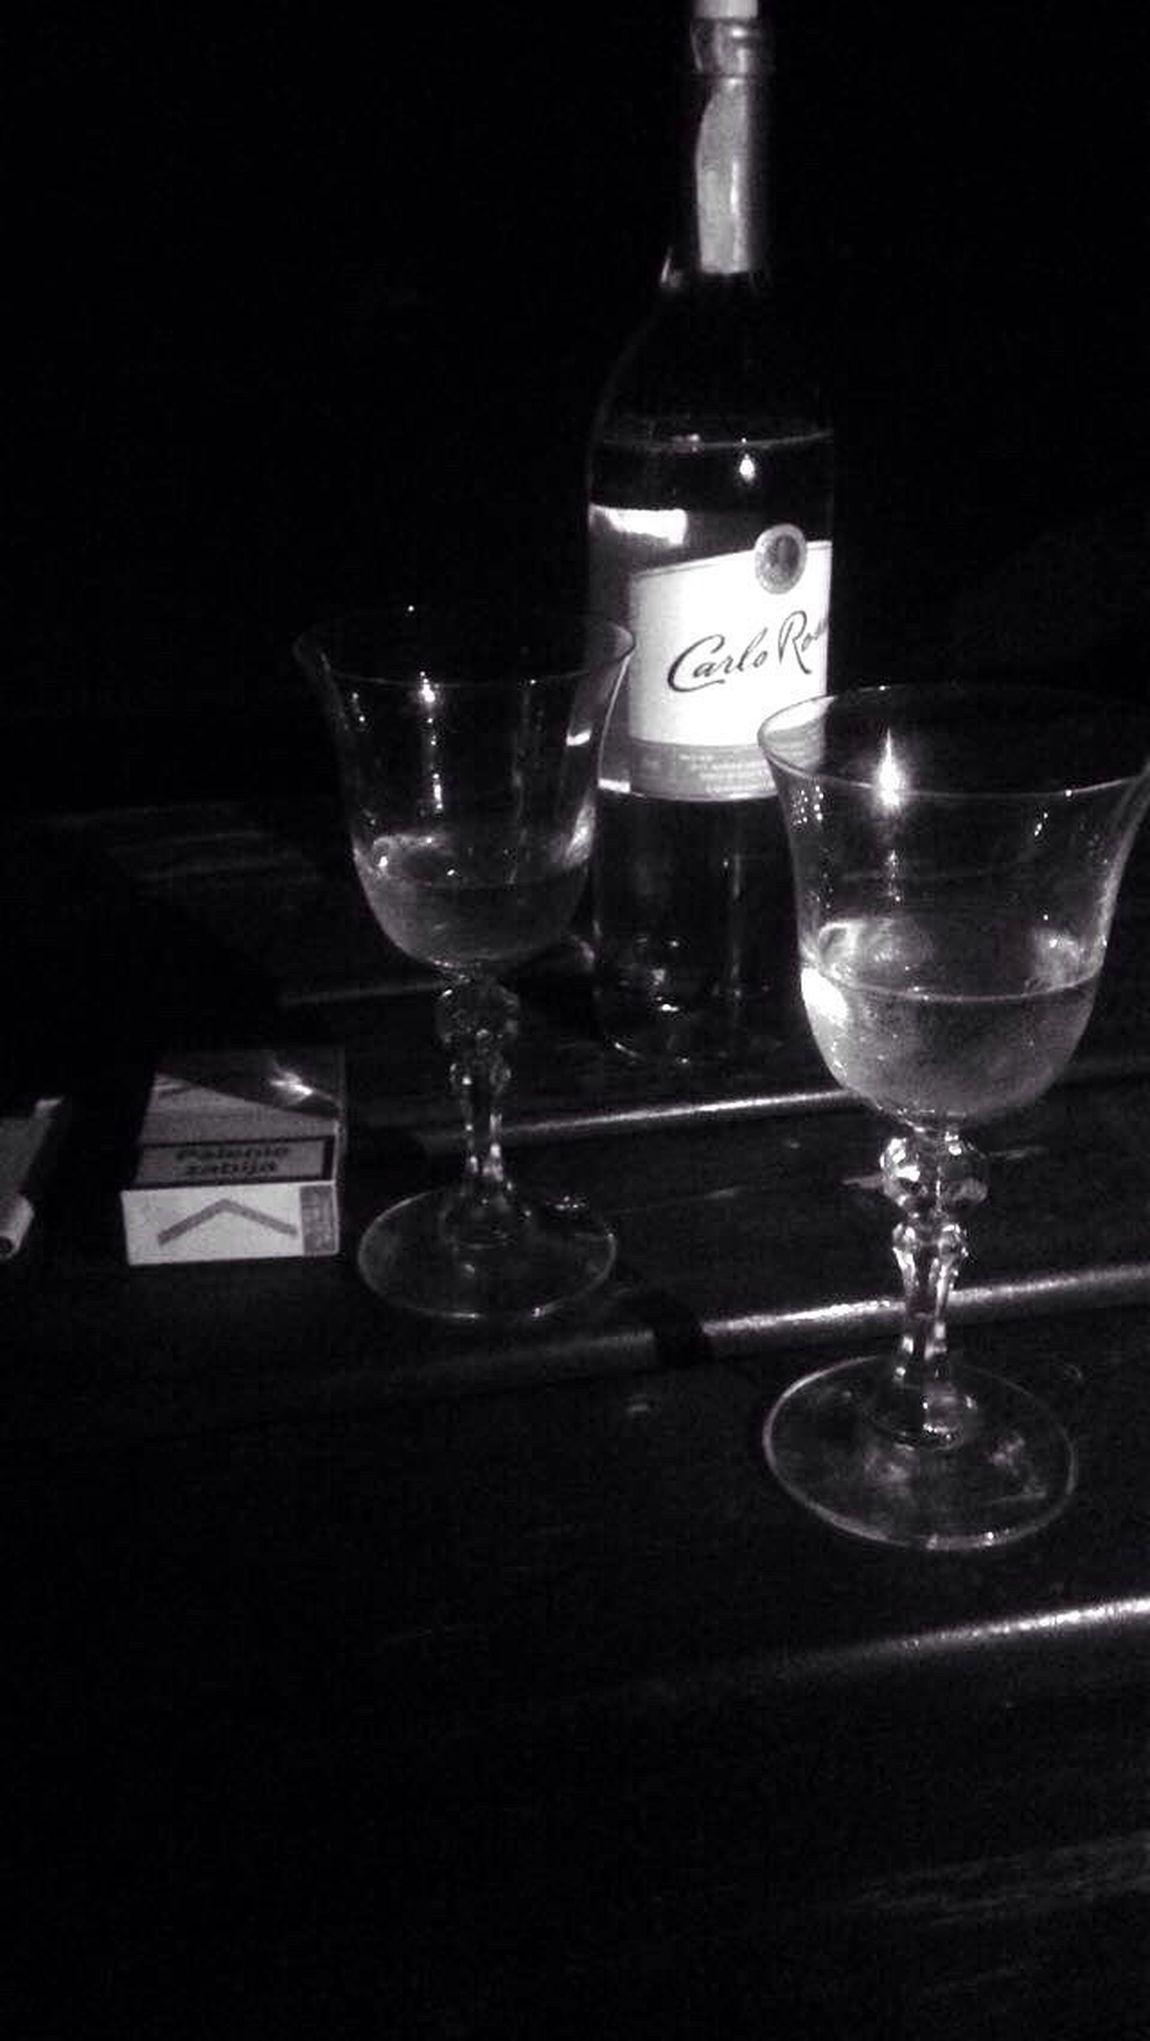 Night Photography Friends Lsm